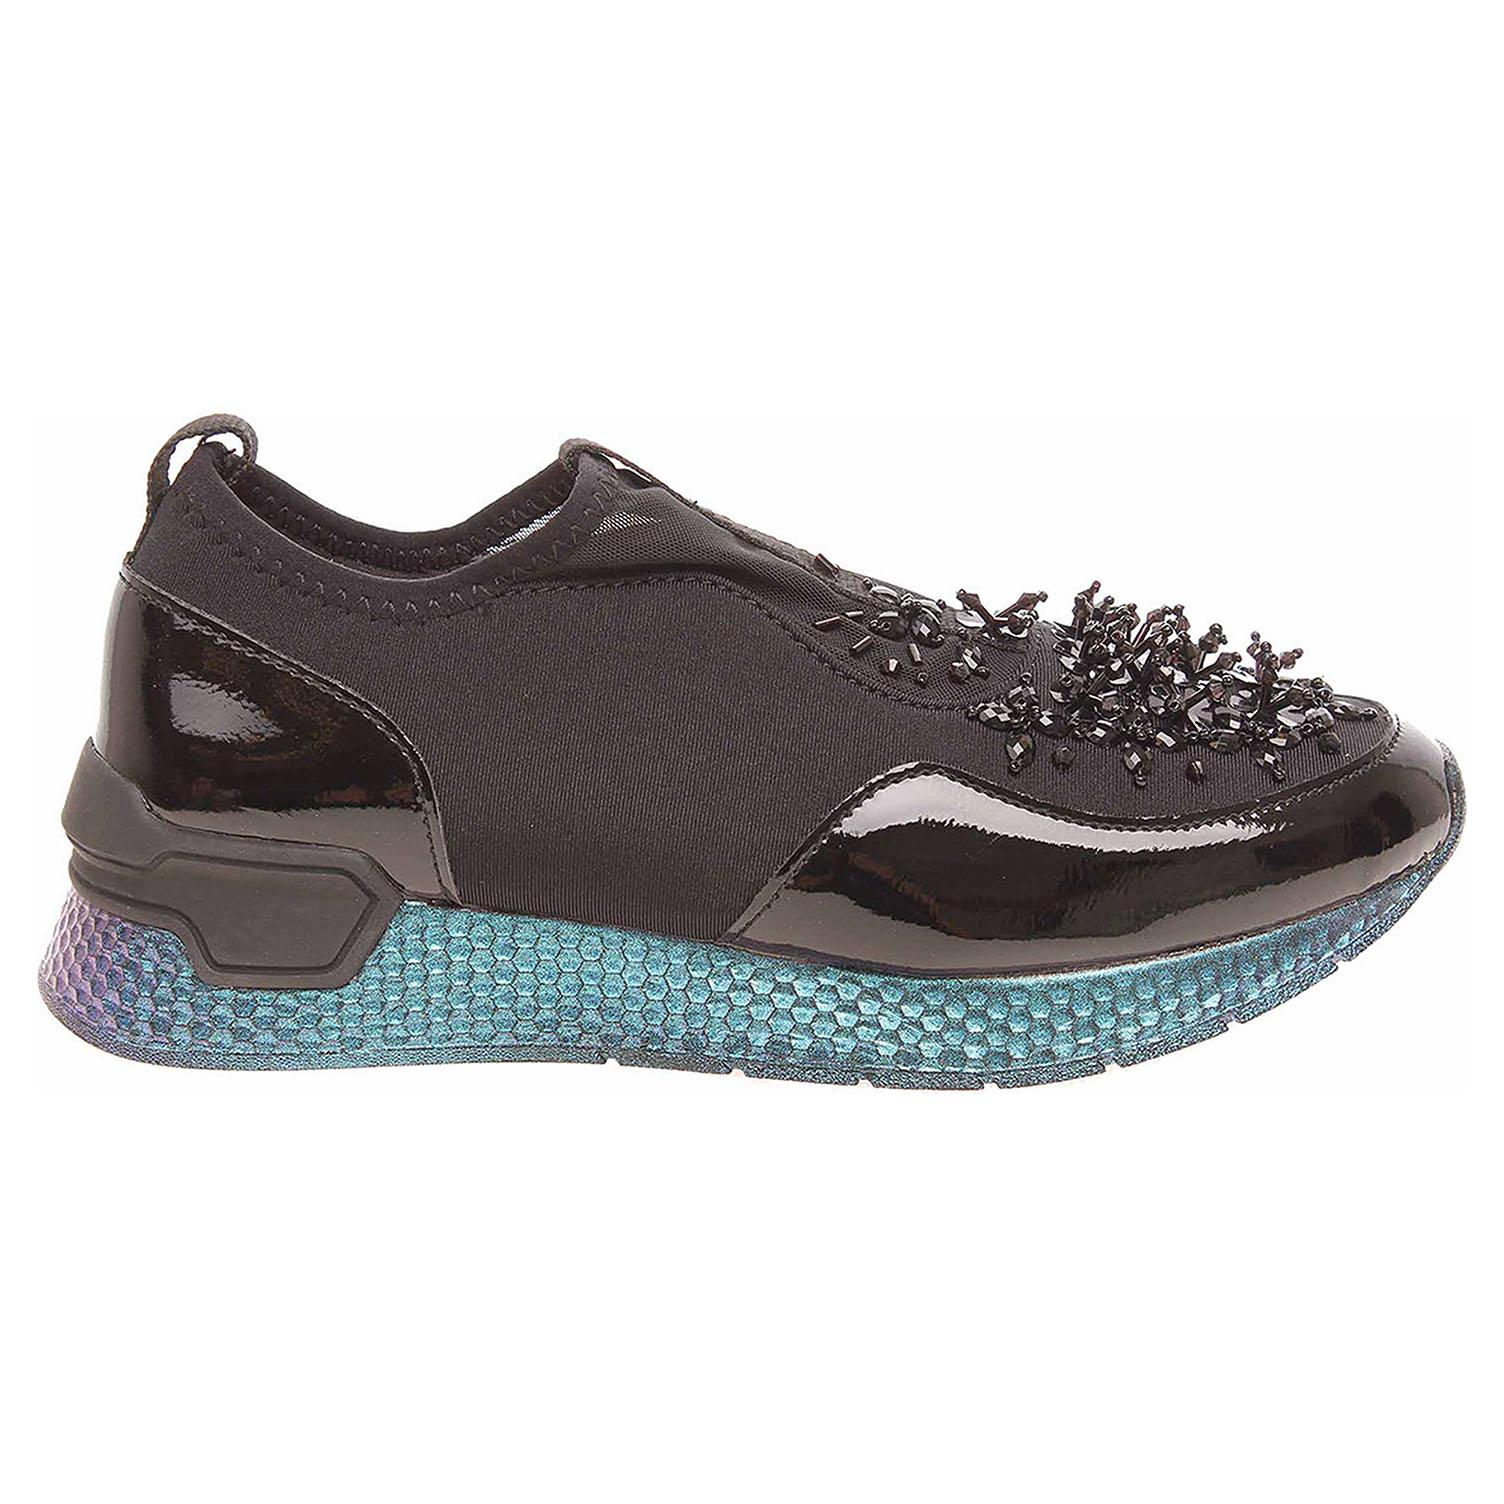 Ecco Tamaris dámská obuv 1-24721-20 black 23100580 69c62fb4c8